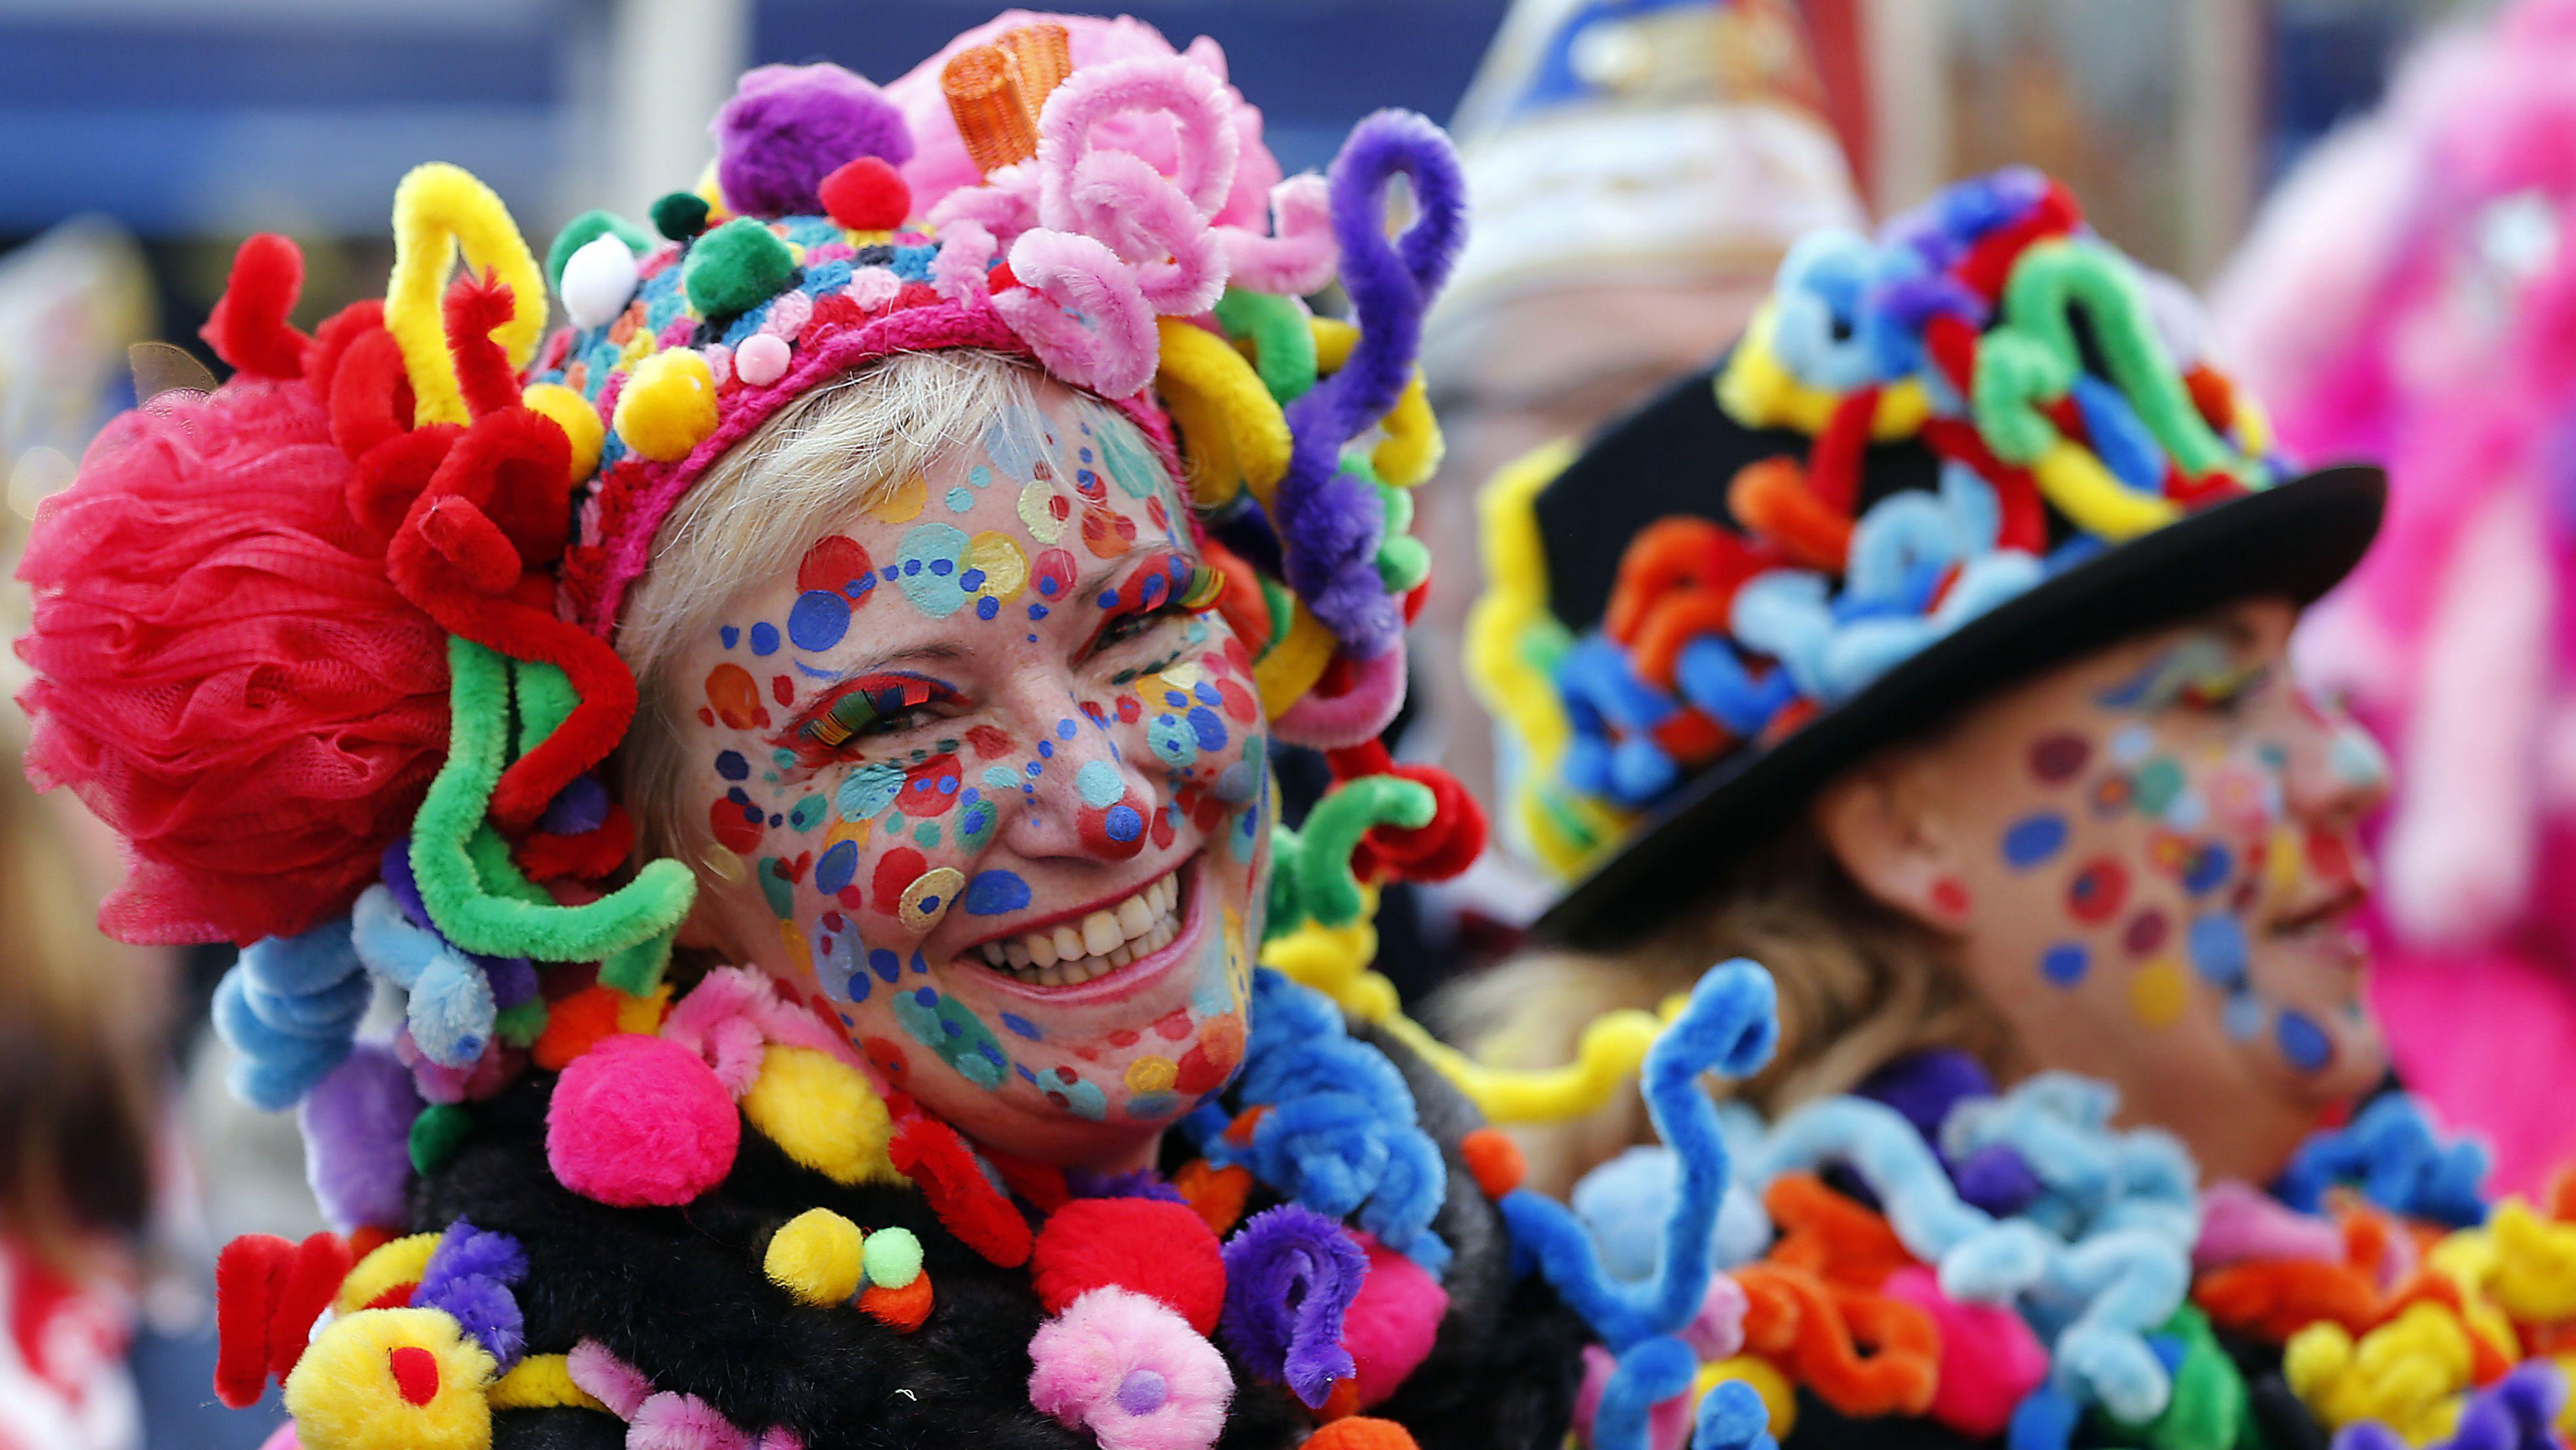 A carnival fool